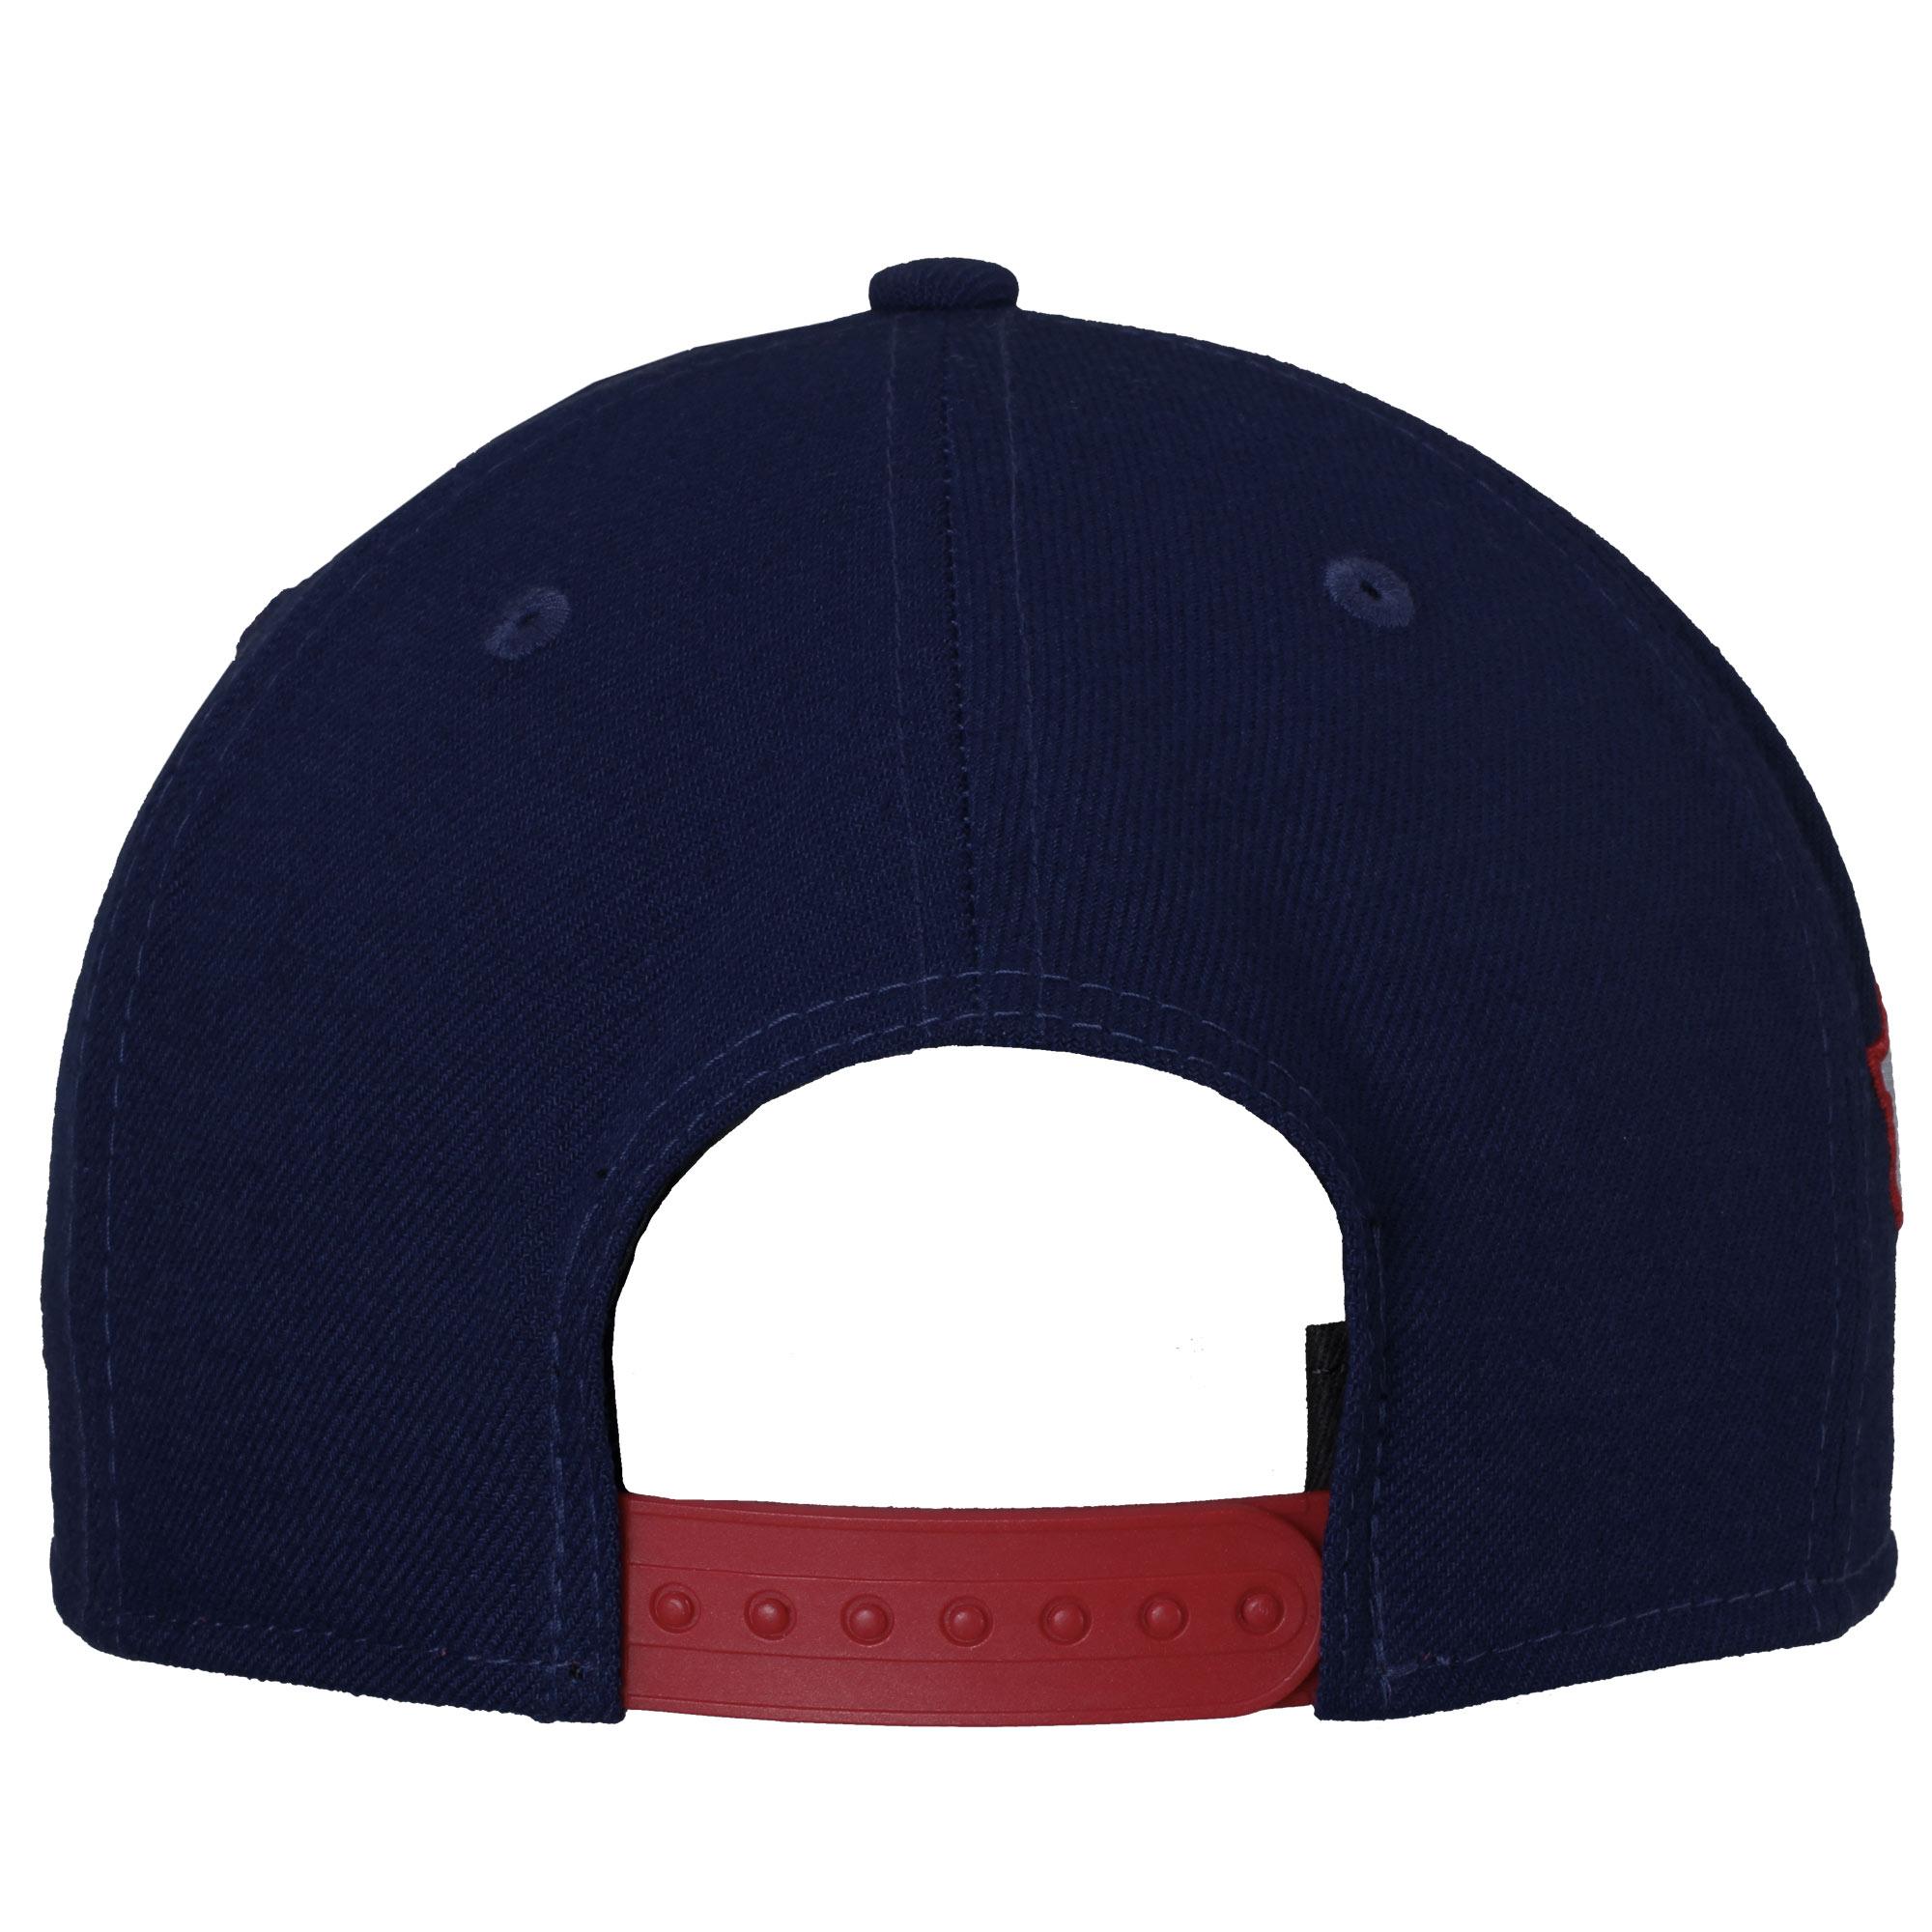 Texas Rangers New Era State Clip Snapback 9FIFTY Hat - Navy - OSFA -  Walmart.com 3b3aa4514ac